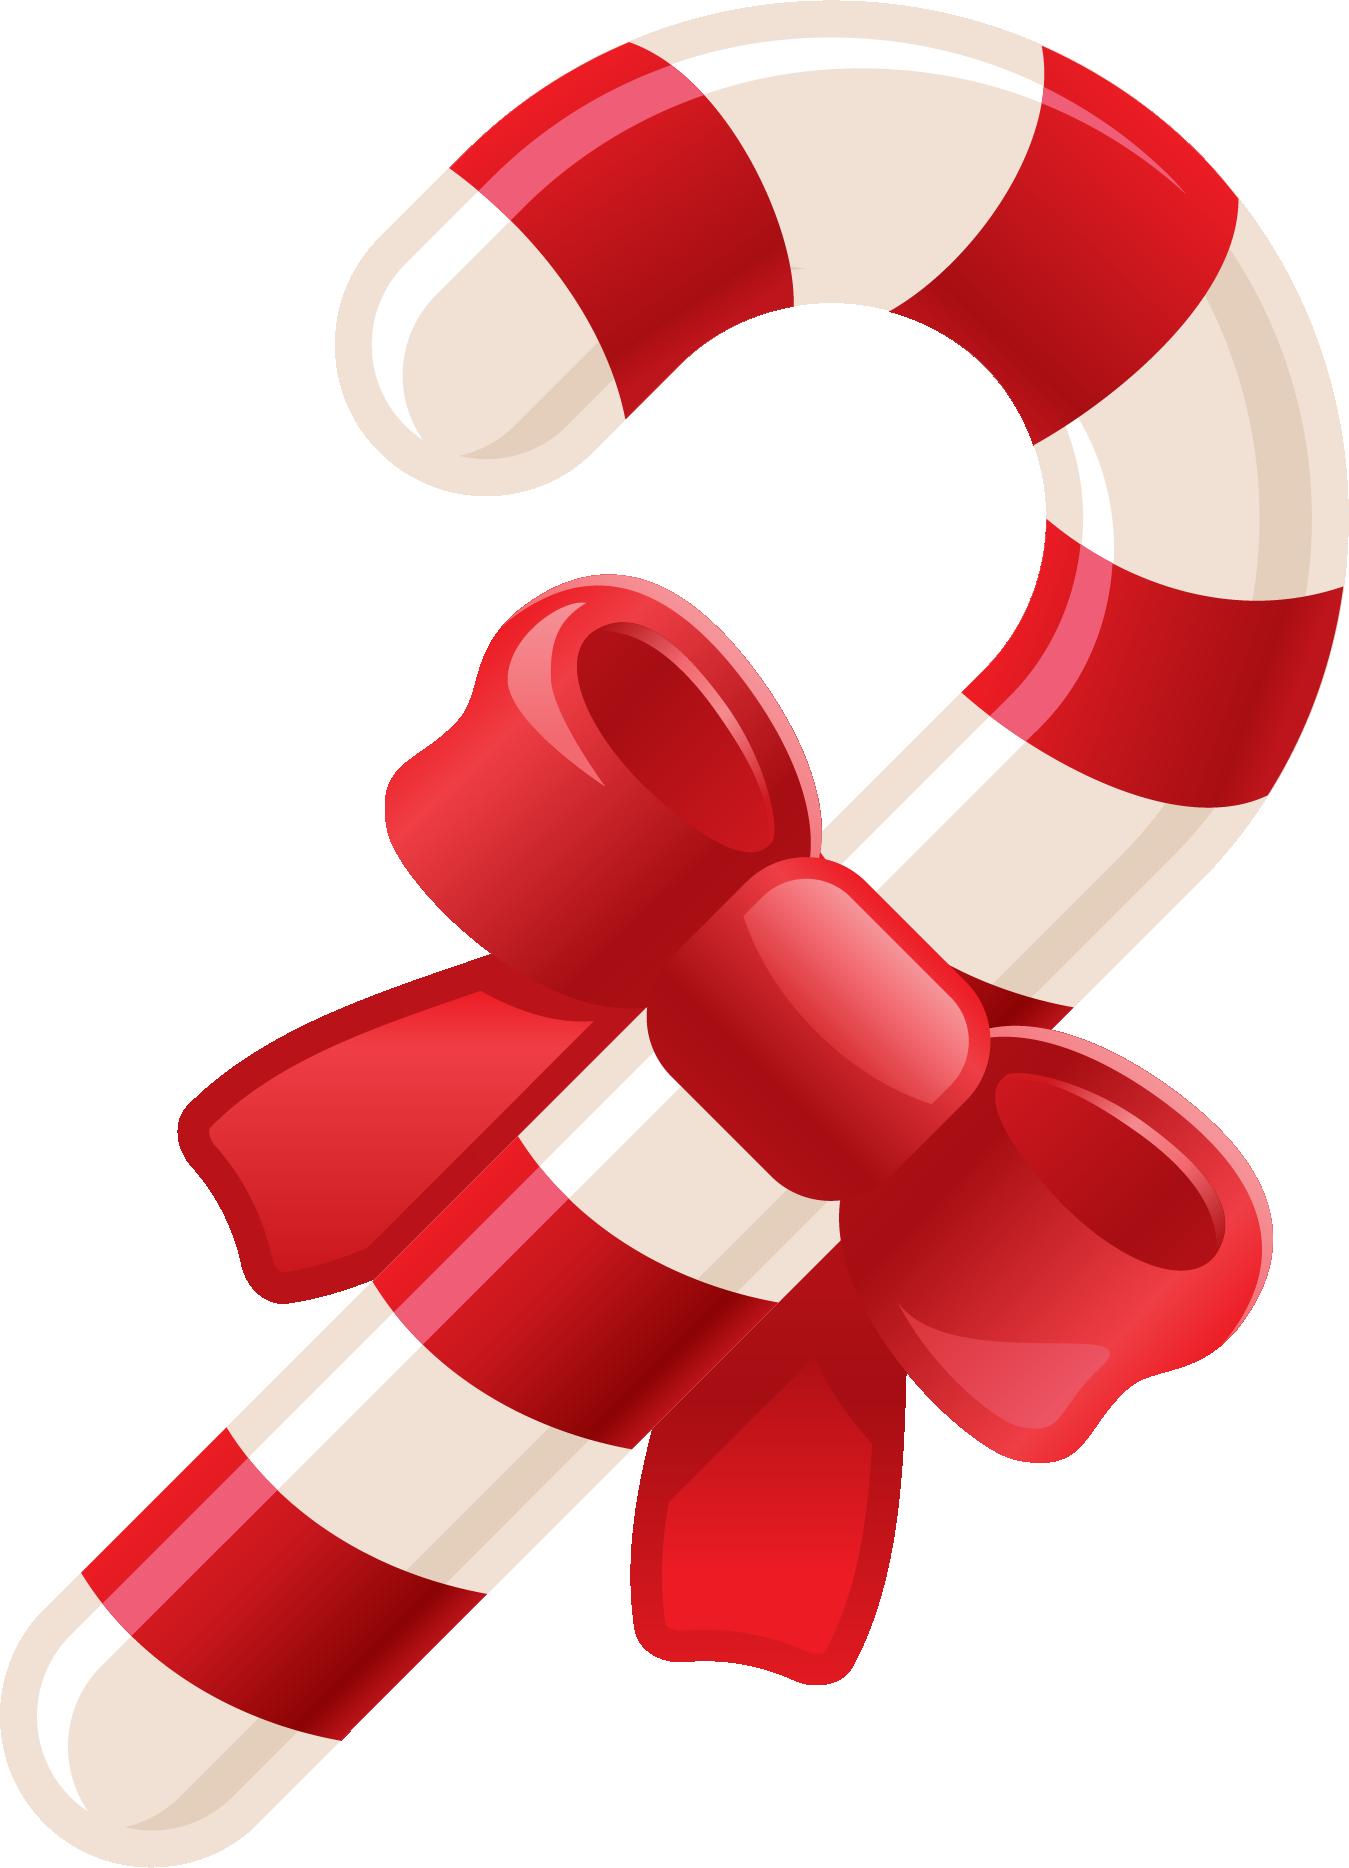 Free christmas clip art. Holiday clipart festive season